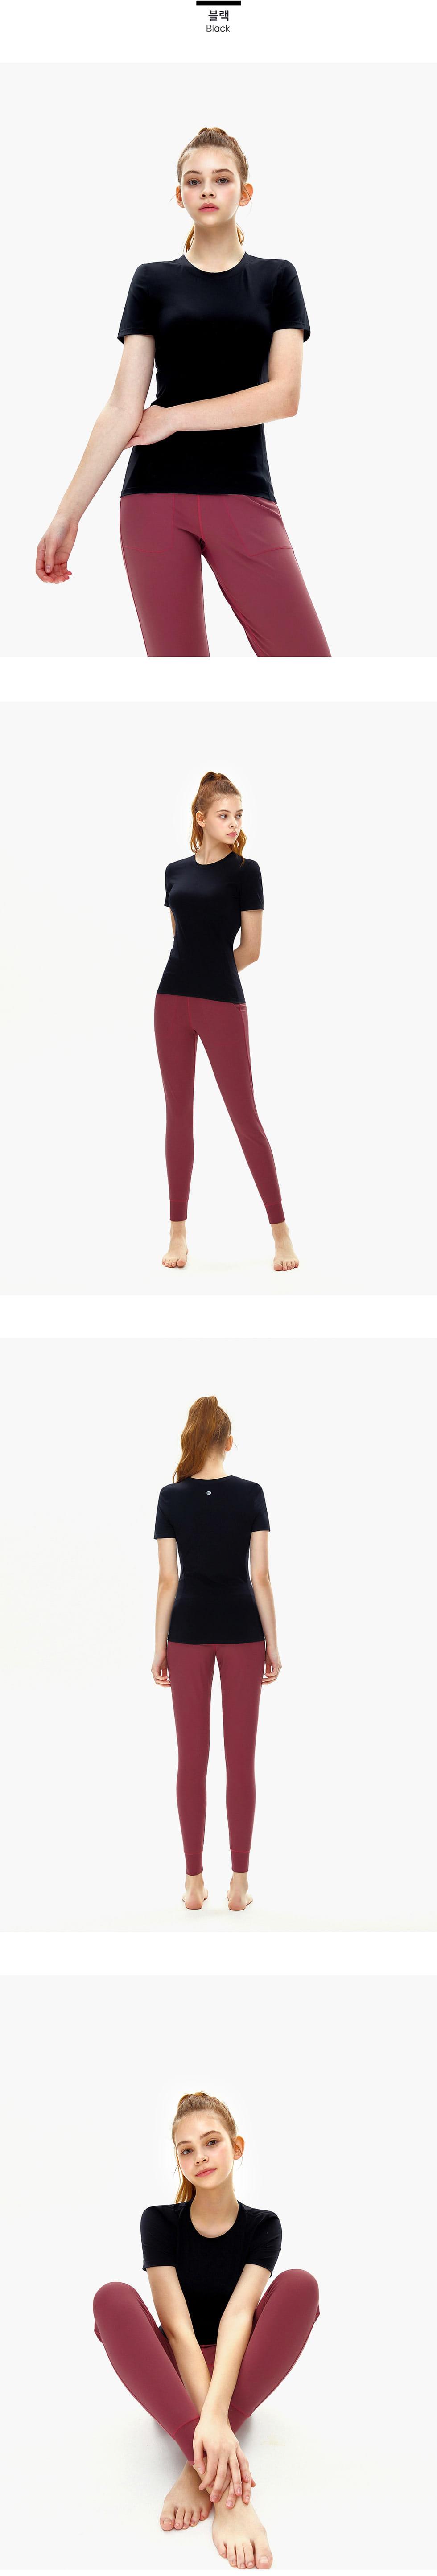 Celine Light Short Sleeve Top